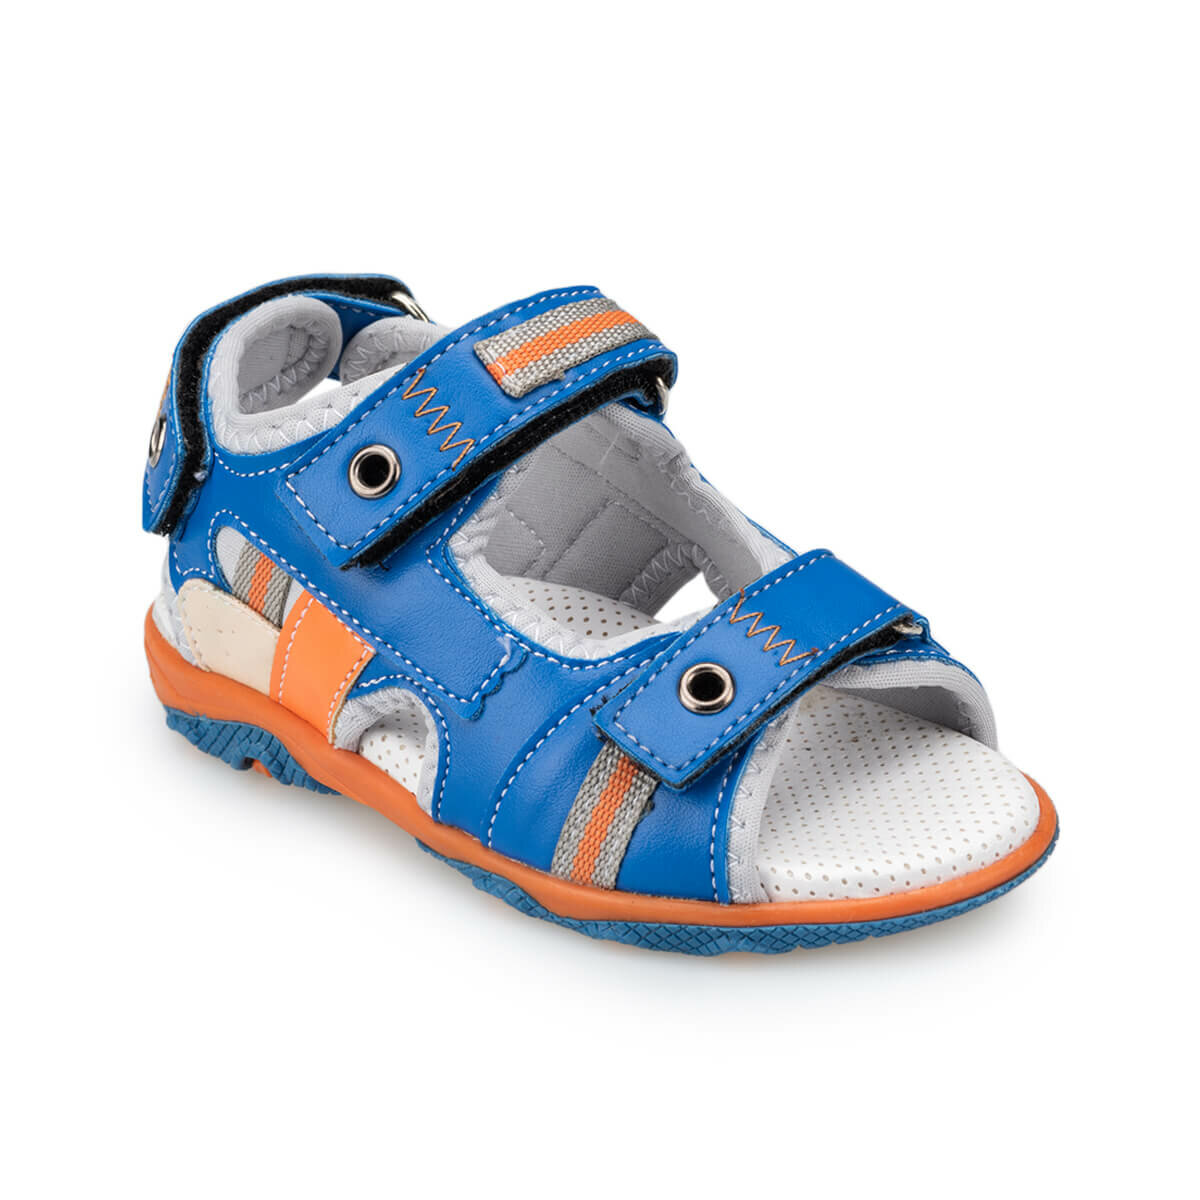 FLO 91. 510046.I Navy Blue Male Child Sports Shoes Polaris